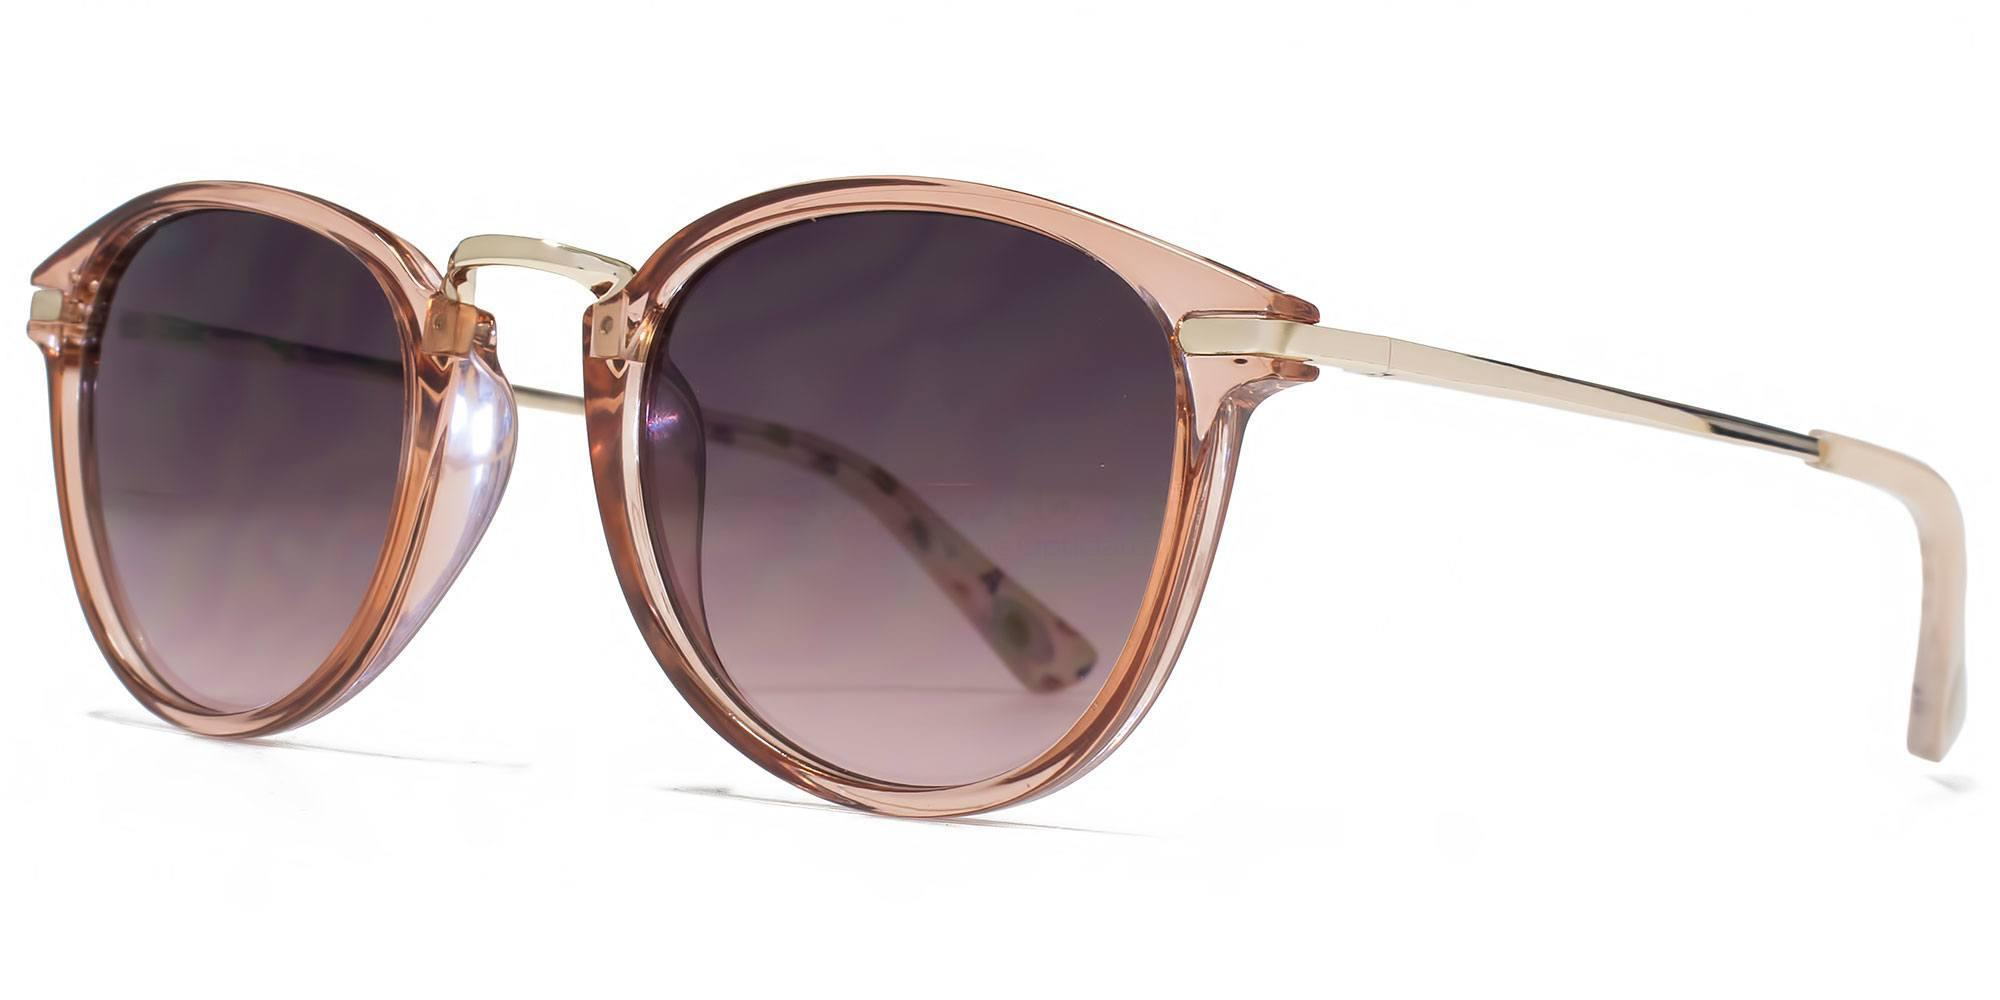 AFS020 JESSE Sunglasses, American Freshman